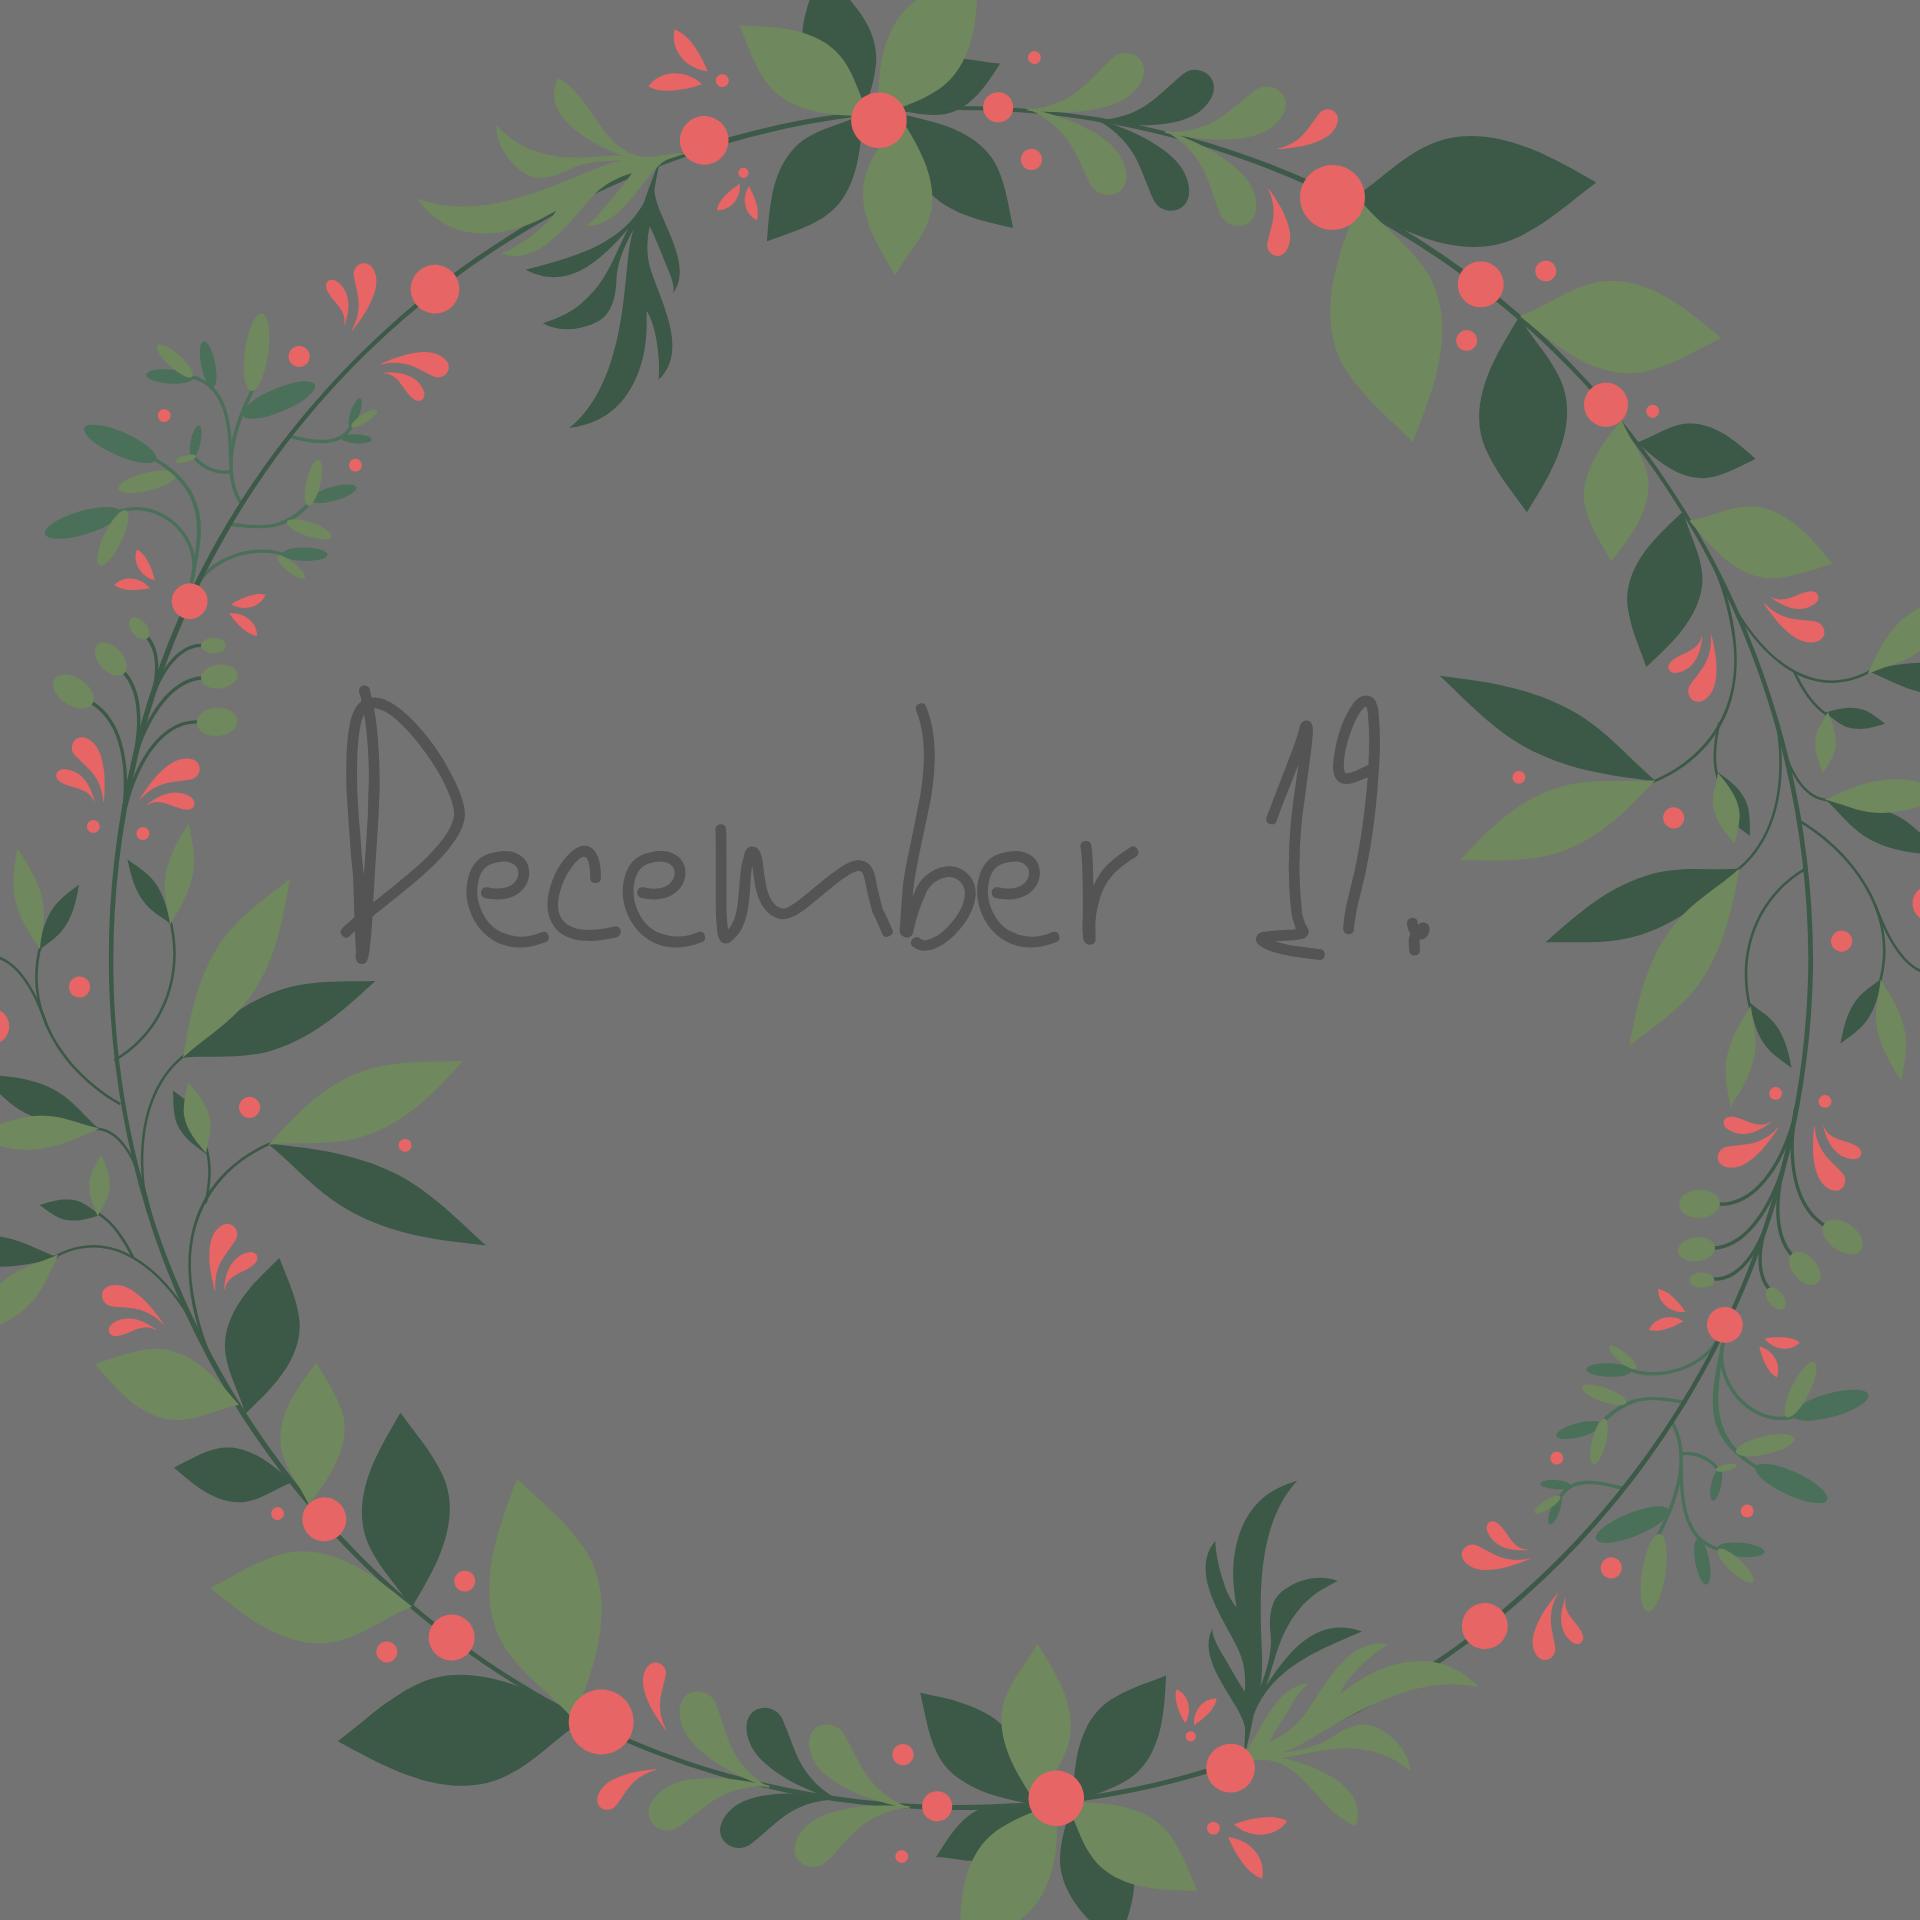 december_19.png